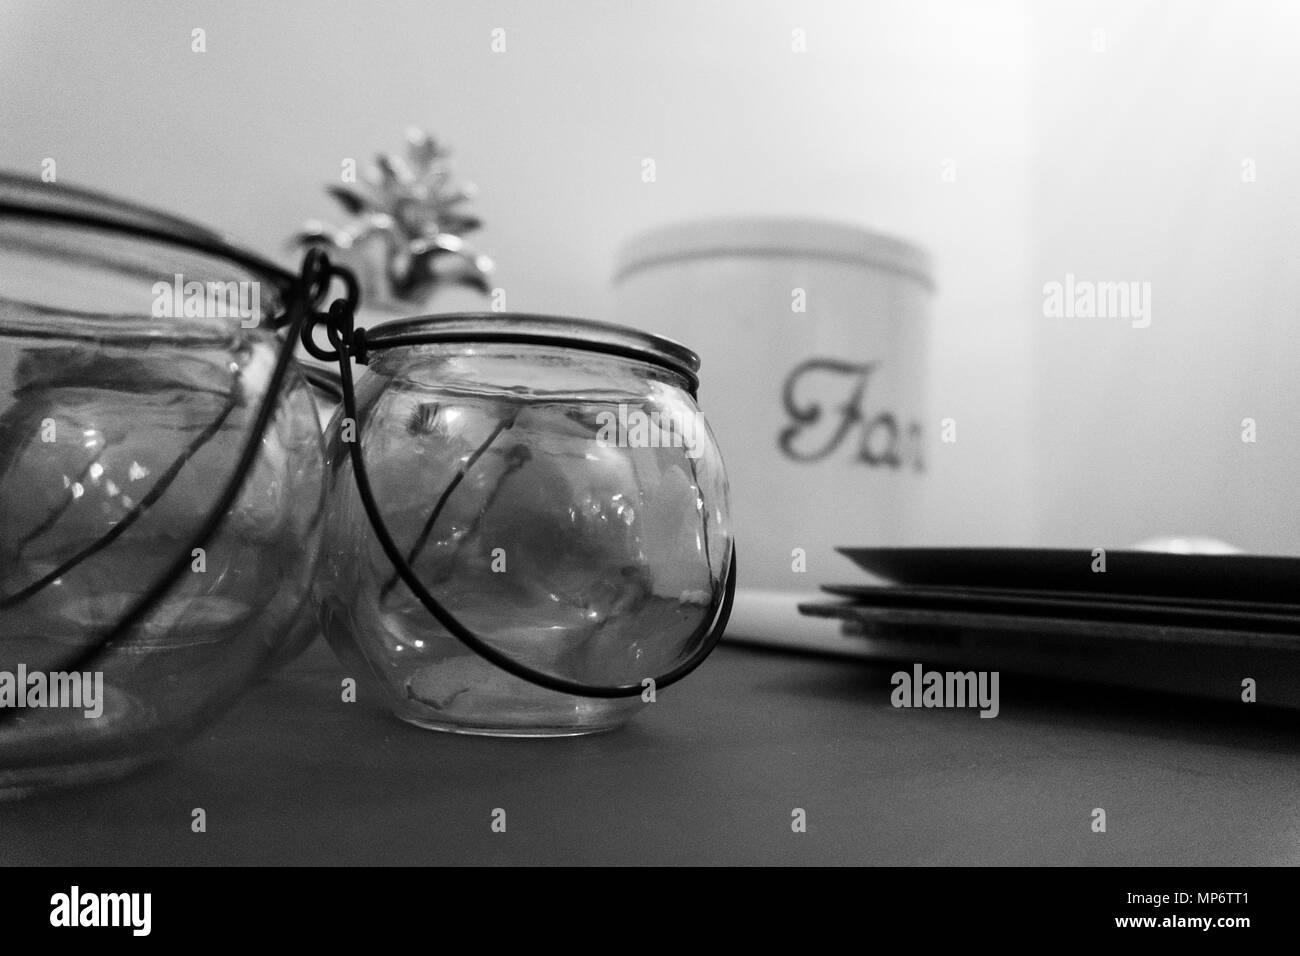 Contenant en verre avec crochet en métal Banque D'Images